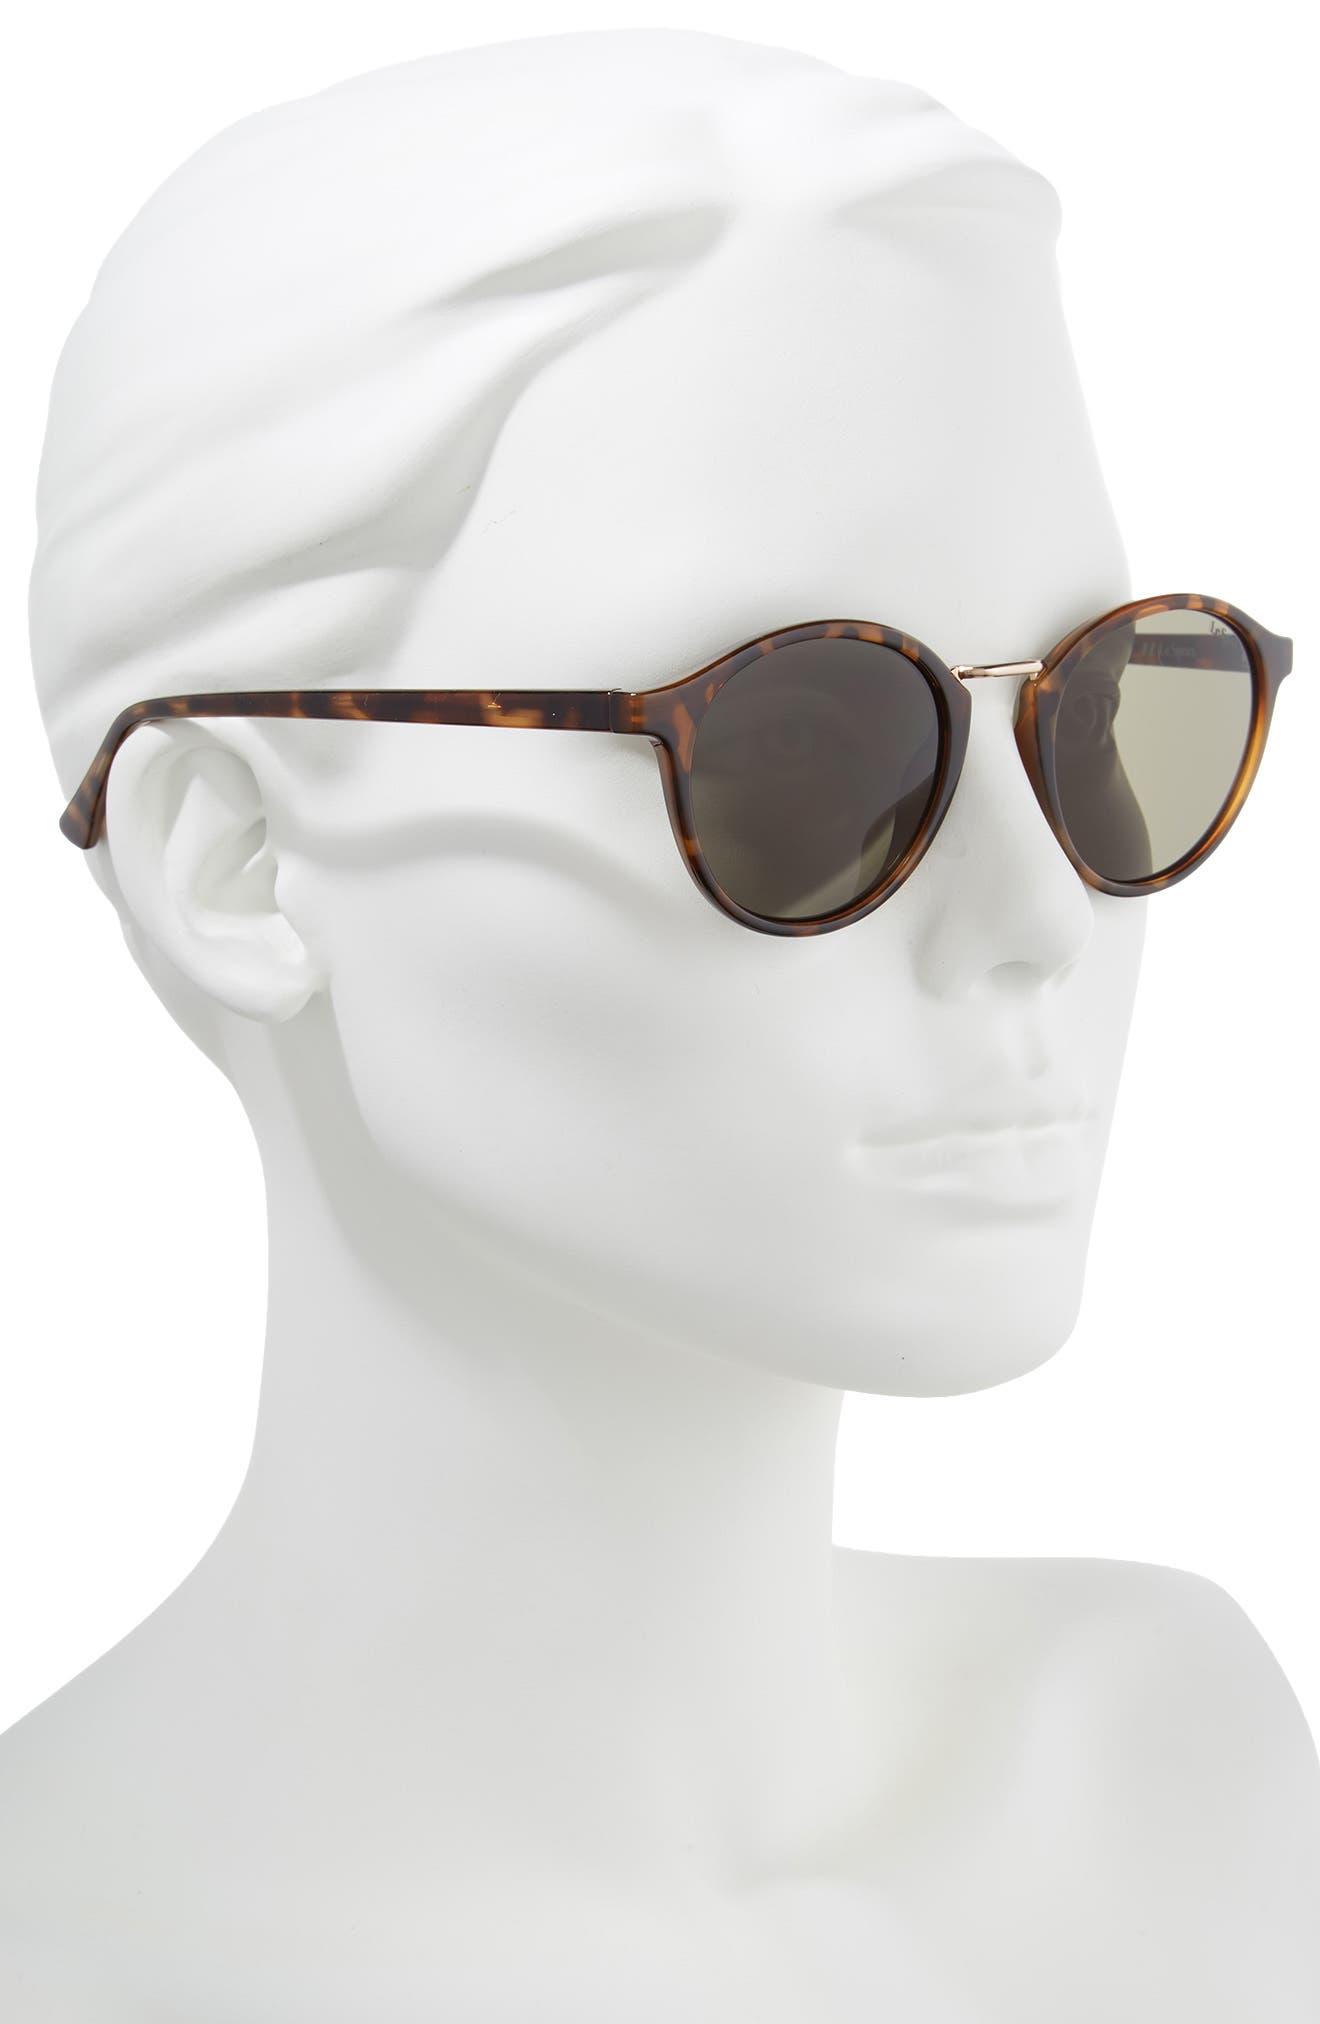 Pardox 49mm Polarized Sunglasses,                             Alternate thumbnail 2, color,                             200